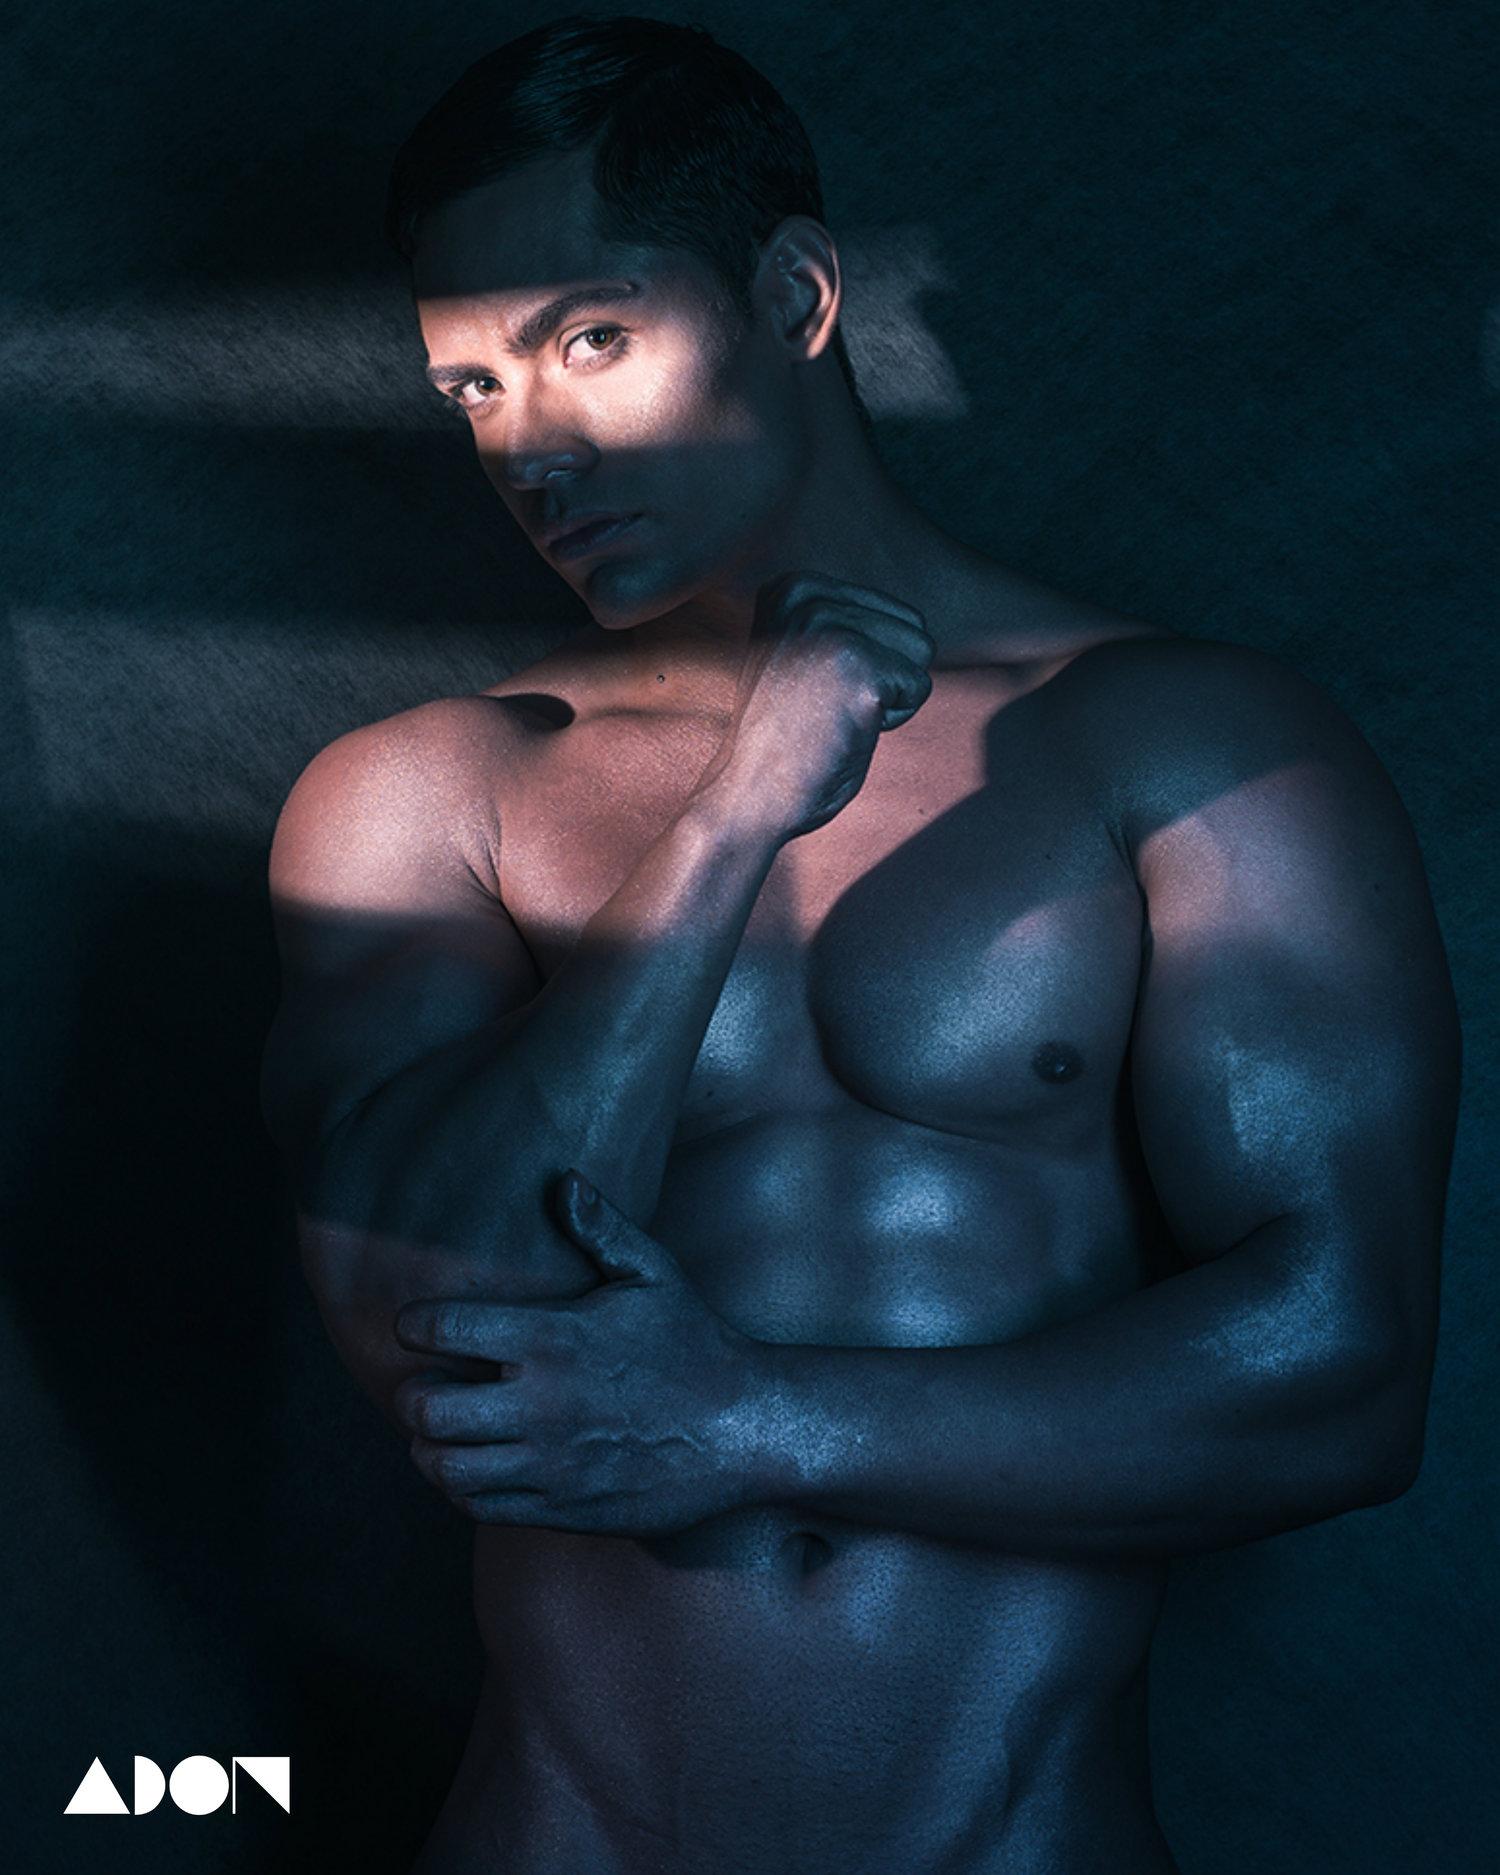 Adon Exclusive: Model Mike Ortiz By Erick Monterrosa